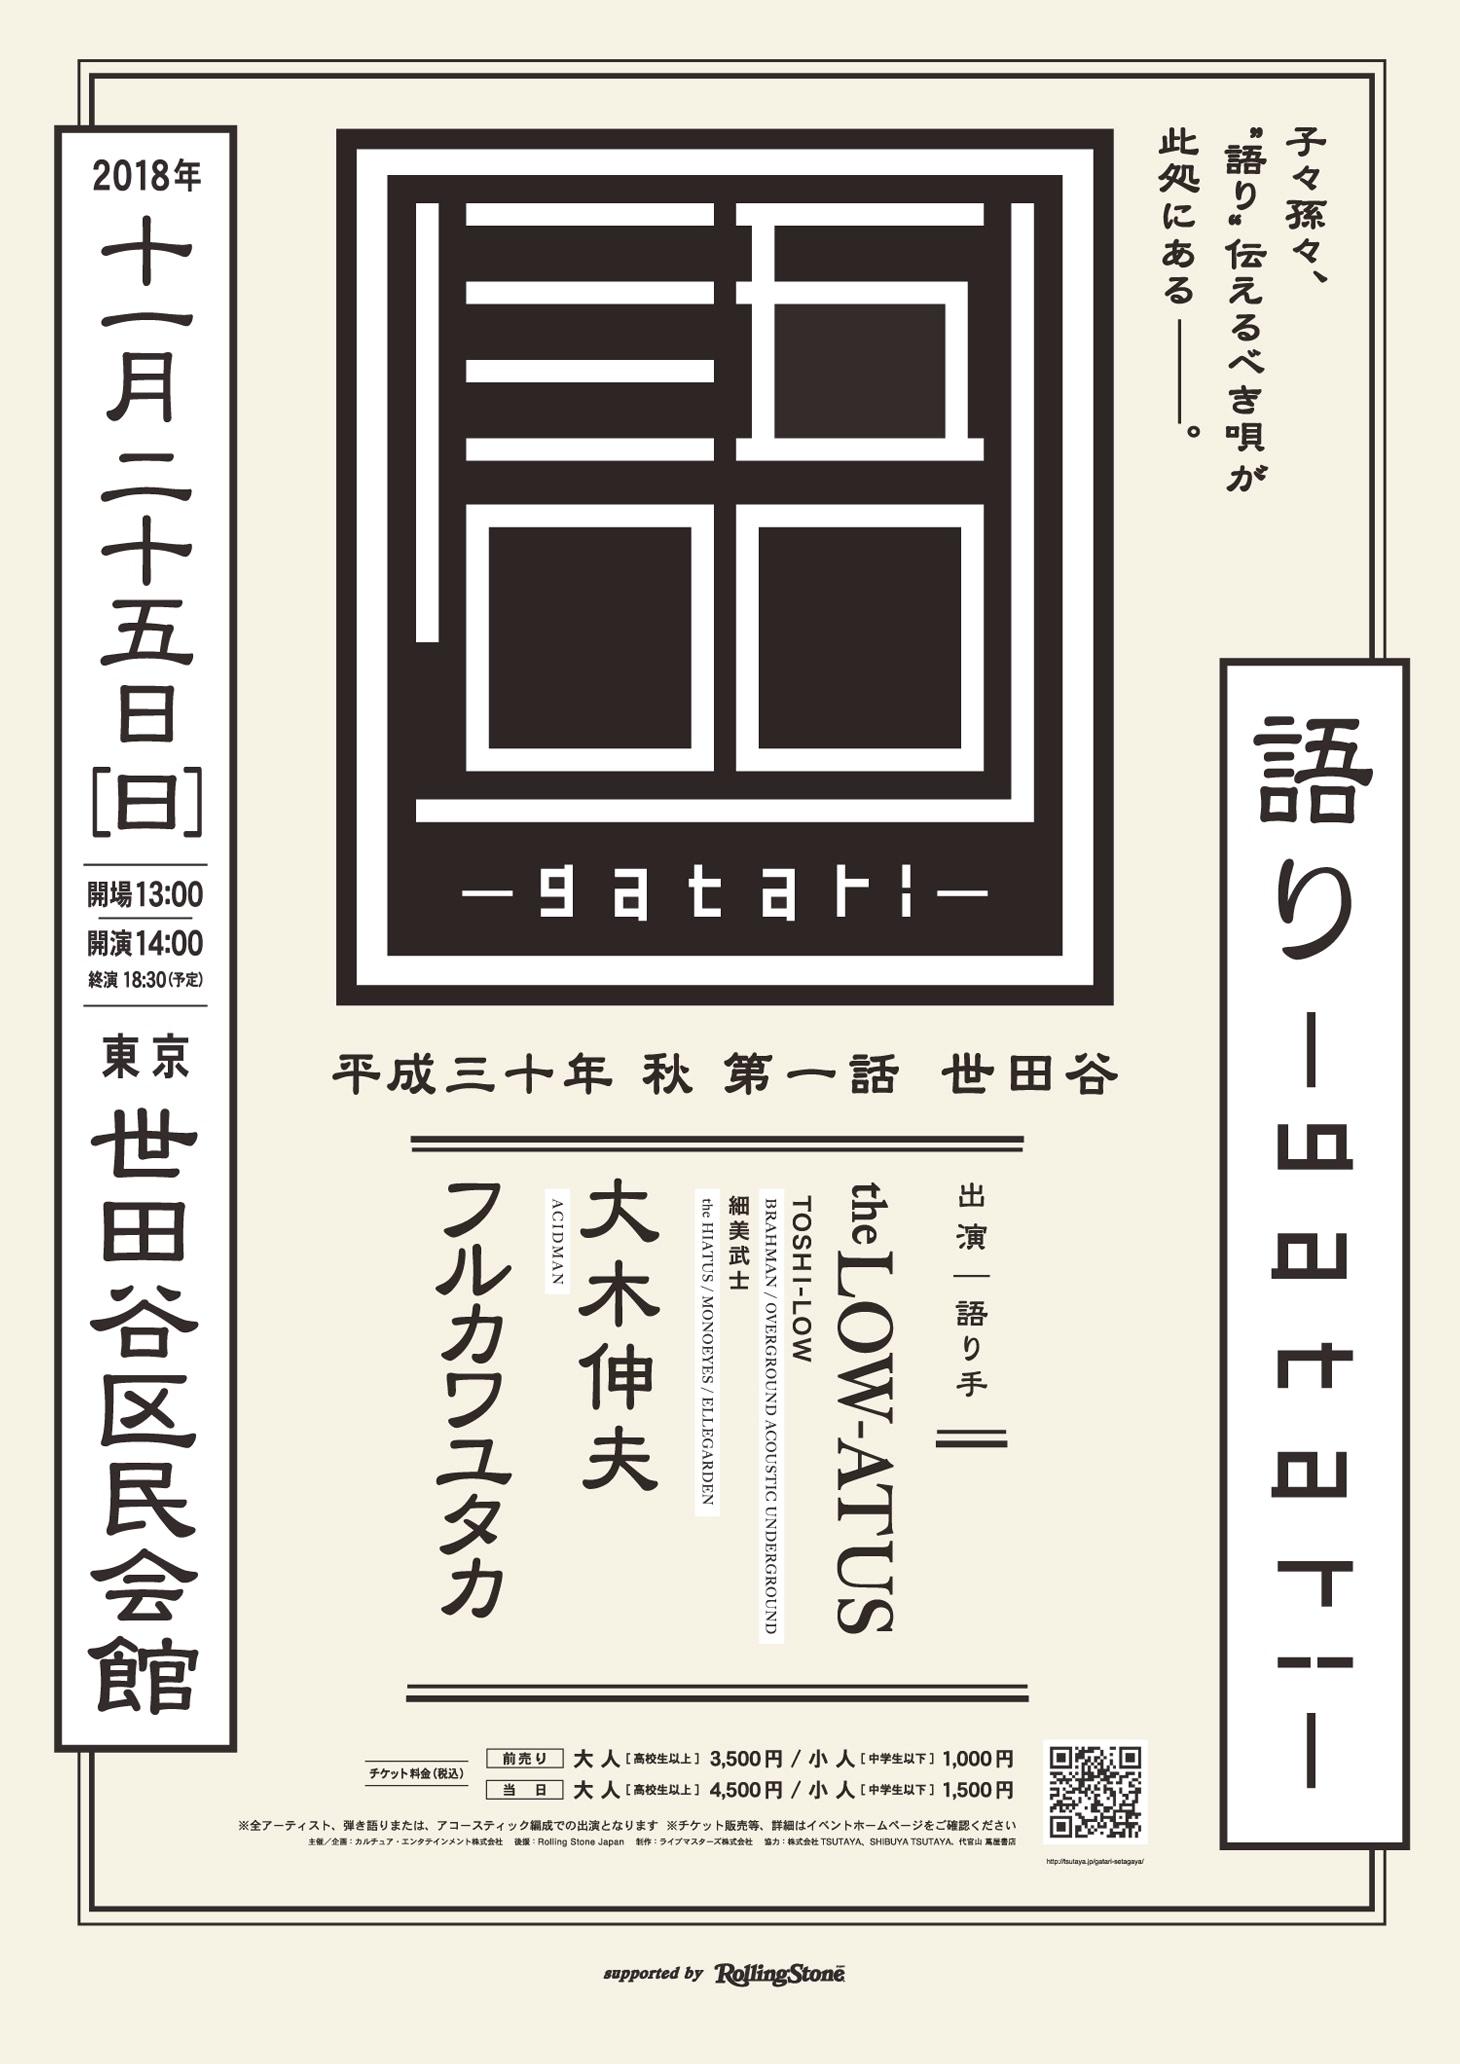 「語り-gatari-」 平成三十年 秋 第一話 世田谷